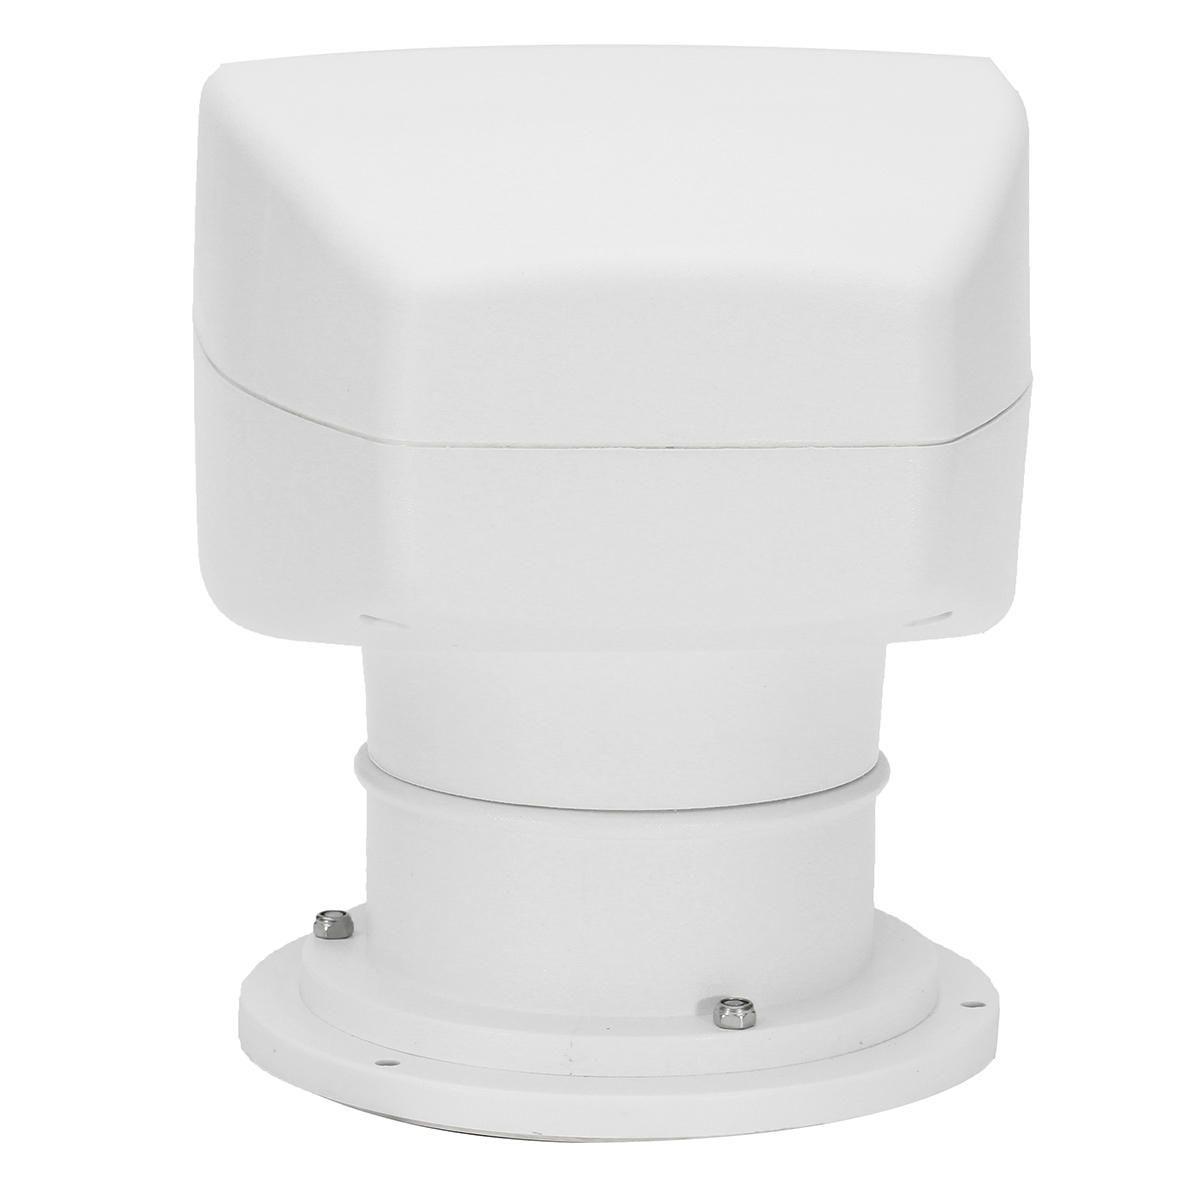 SLG US$90.63 7Inch 100W Remote Control LED Searchlight Marine Spotlight Search Light 12V for Boat Truck SUV Car